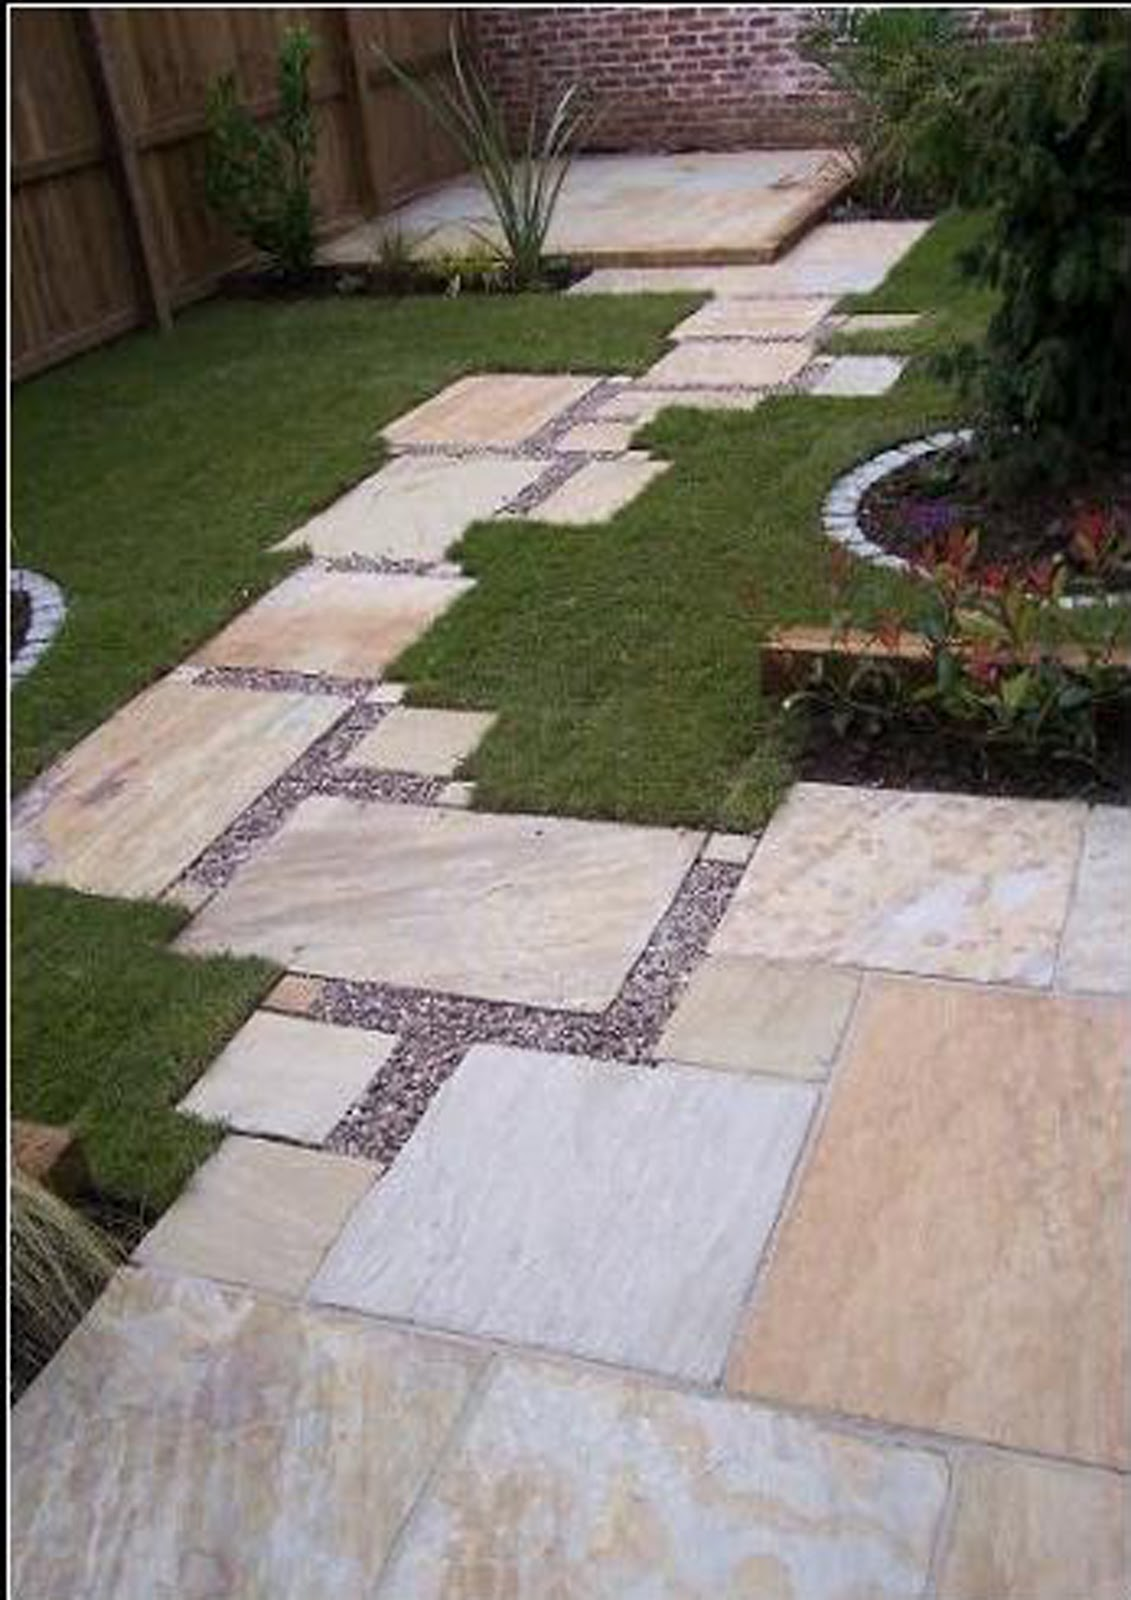 Excellent aiuole giardino aiuole da giardino quale for Bricoman arredo giardino